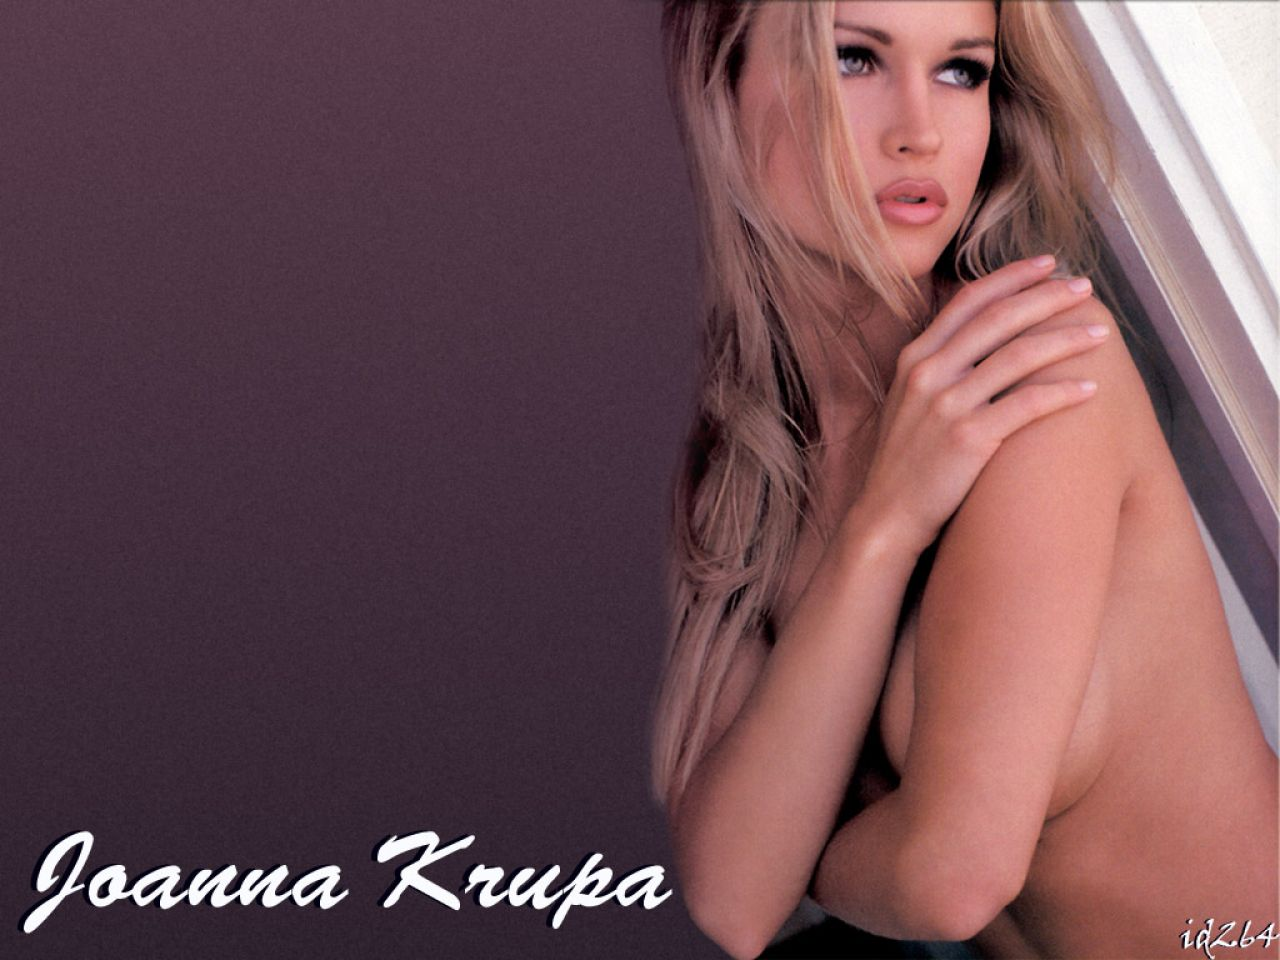 http://1.bp.blogspot.com/-SatnCX8hCrE/UPNNhpTTC_I/AAAAAAAAA74/mzYADXnpxvw/s1600/joanna-krupa-1.jpg